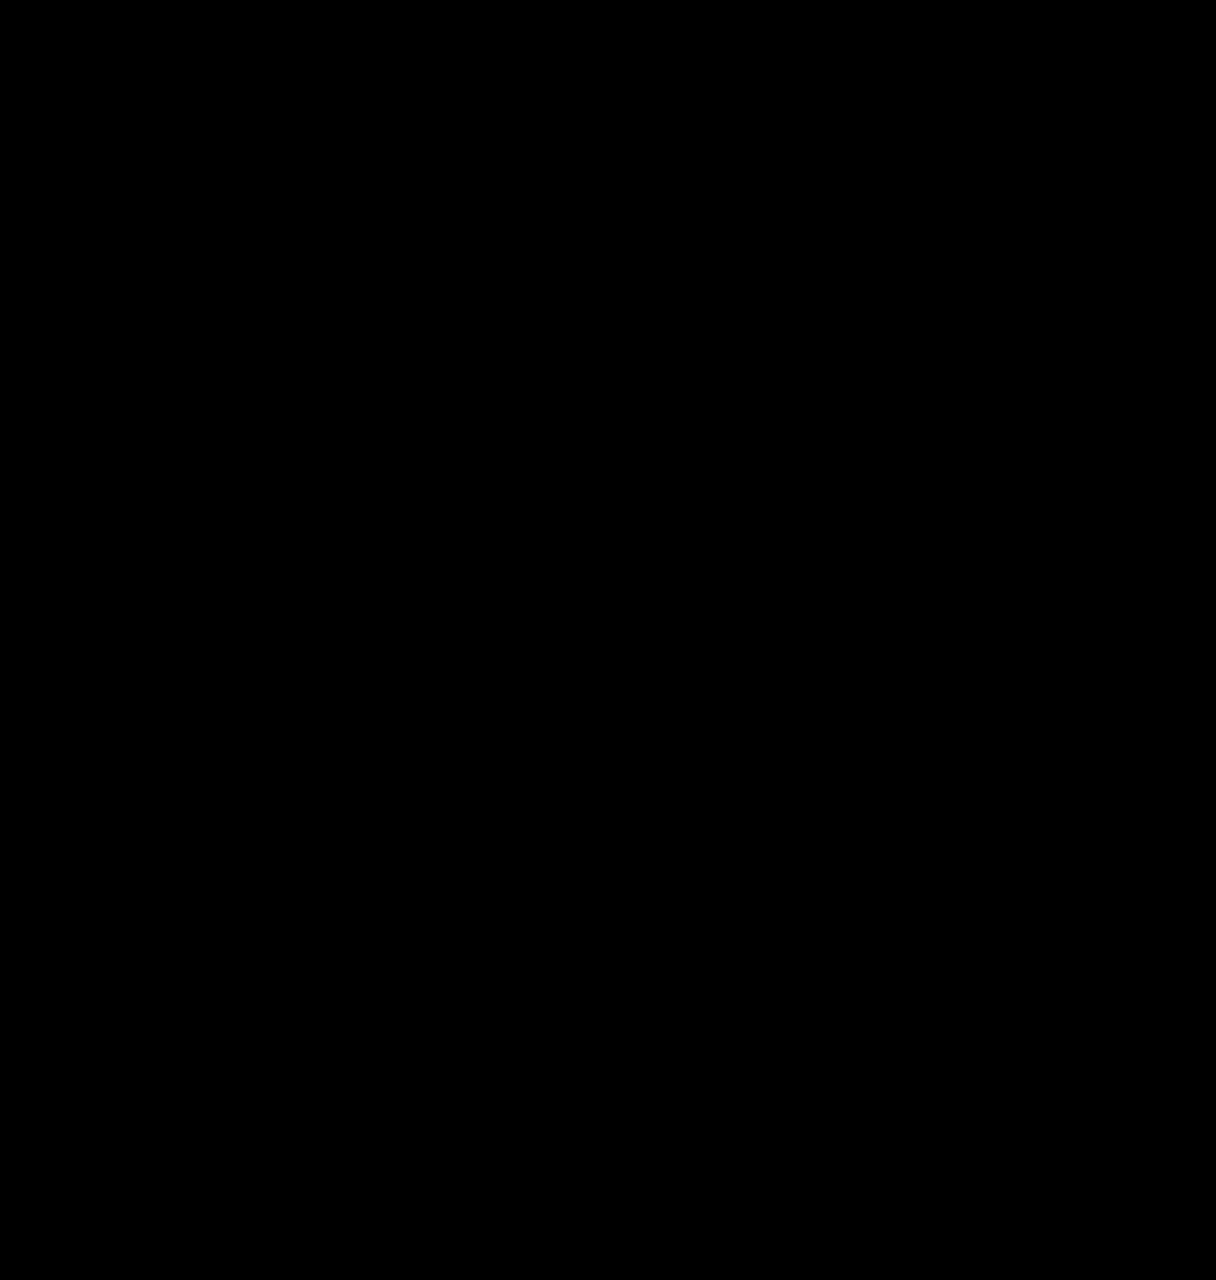 Rampant Rampant (2018)